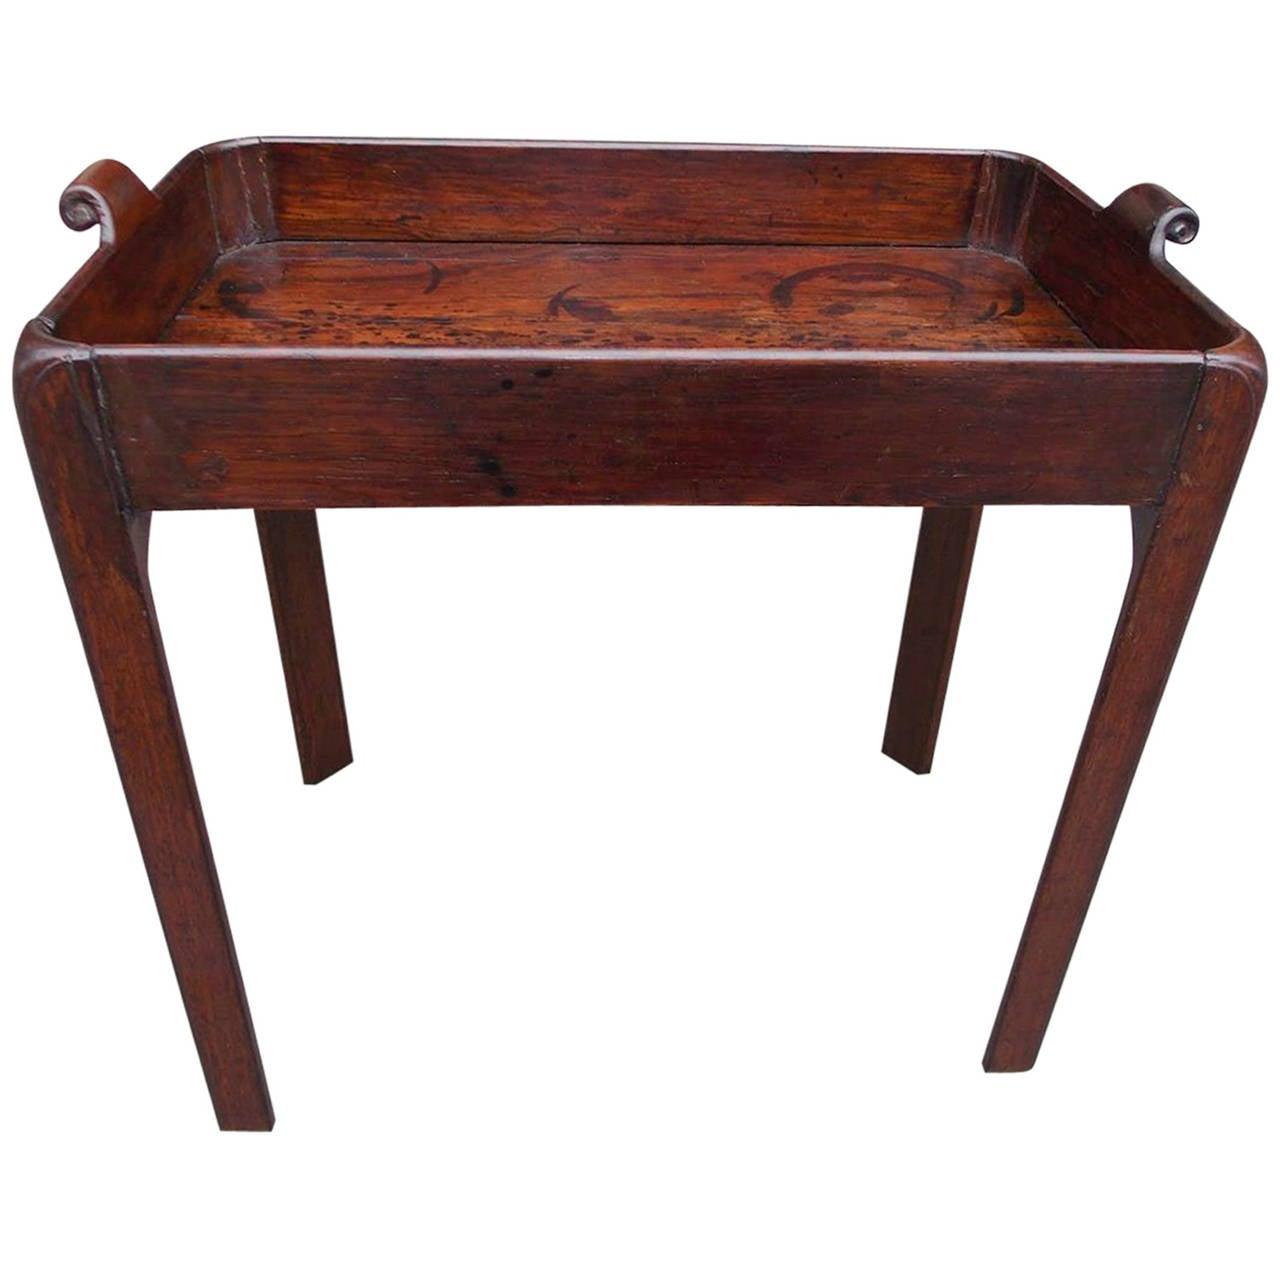 English Chippendale Mahogany Tray Table, Circa 1770